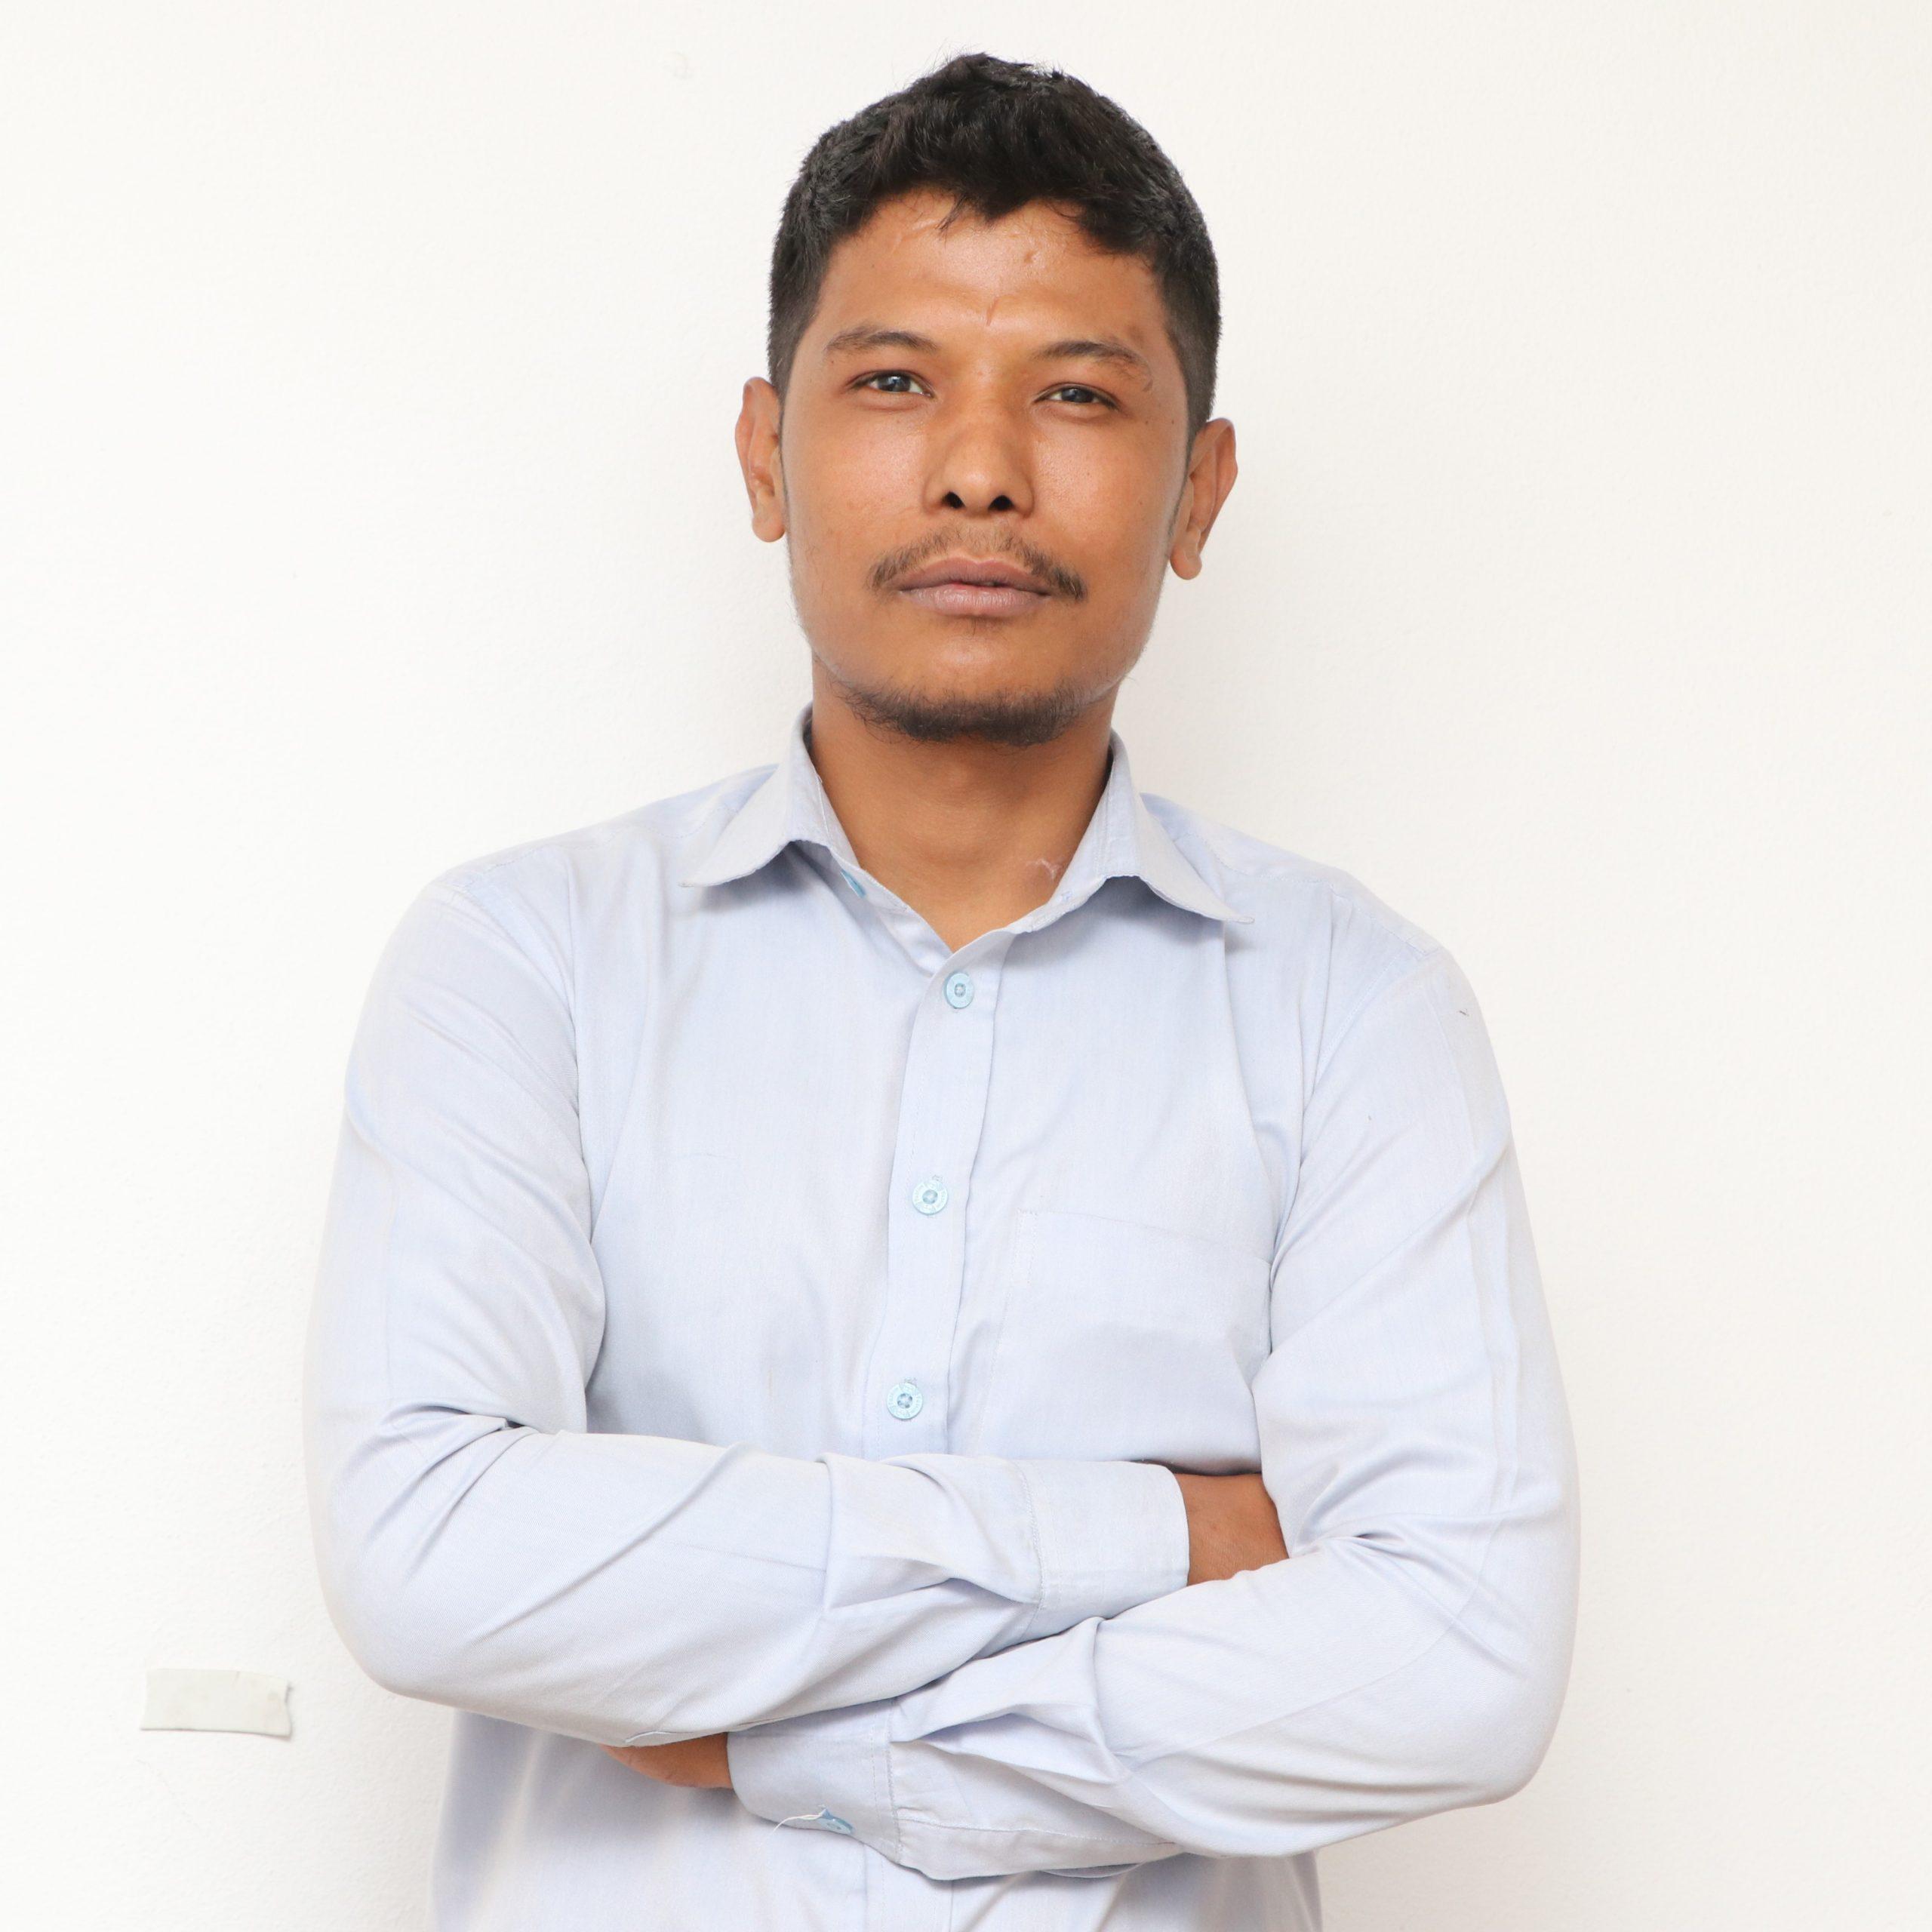 Er. Robin Chaudhary